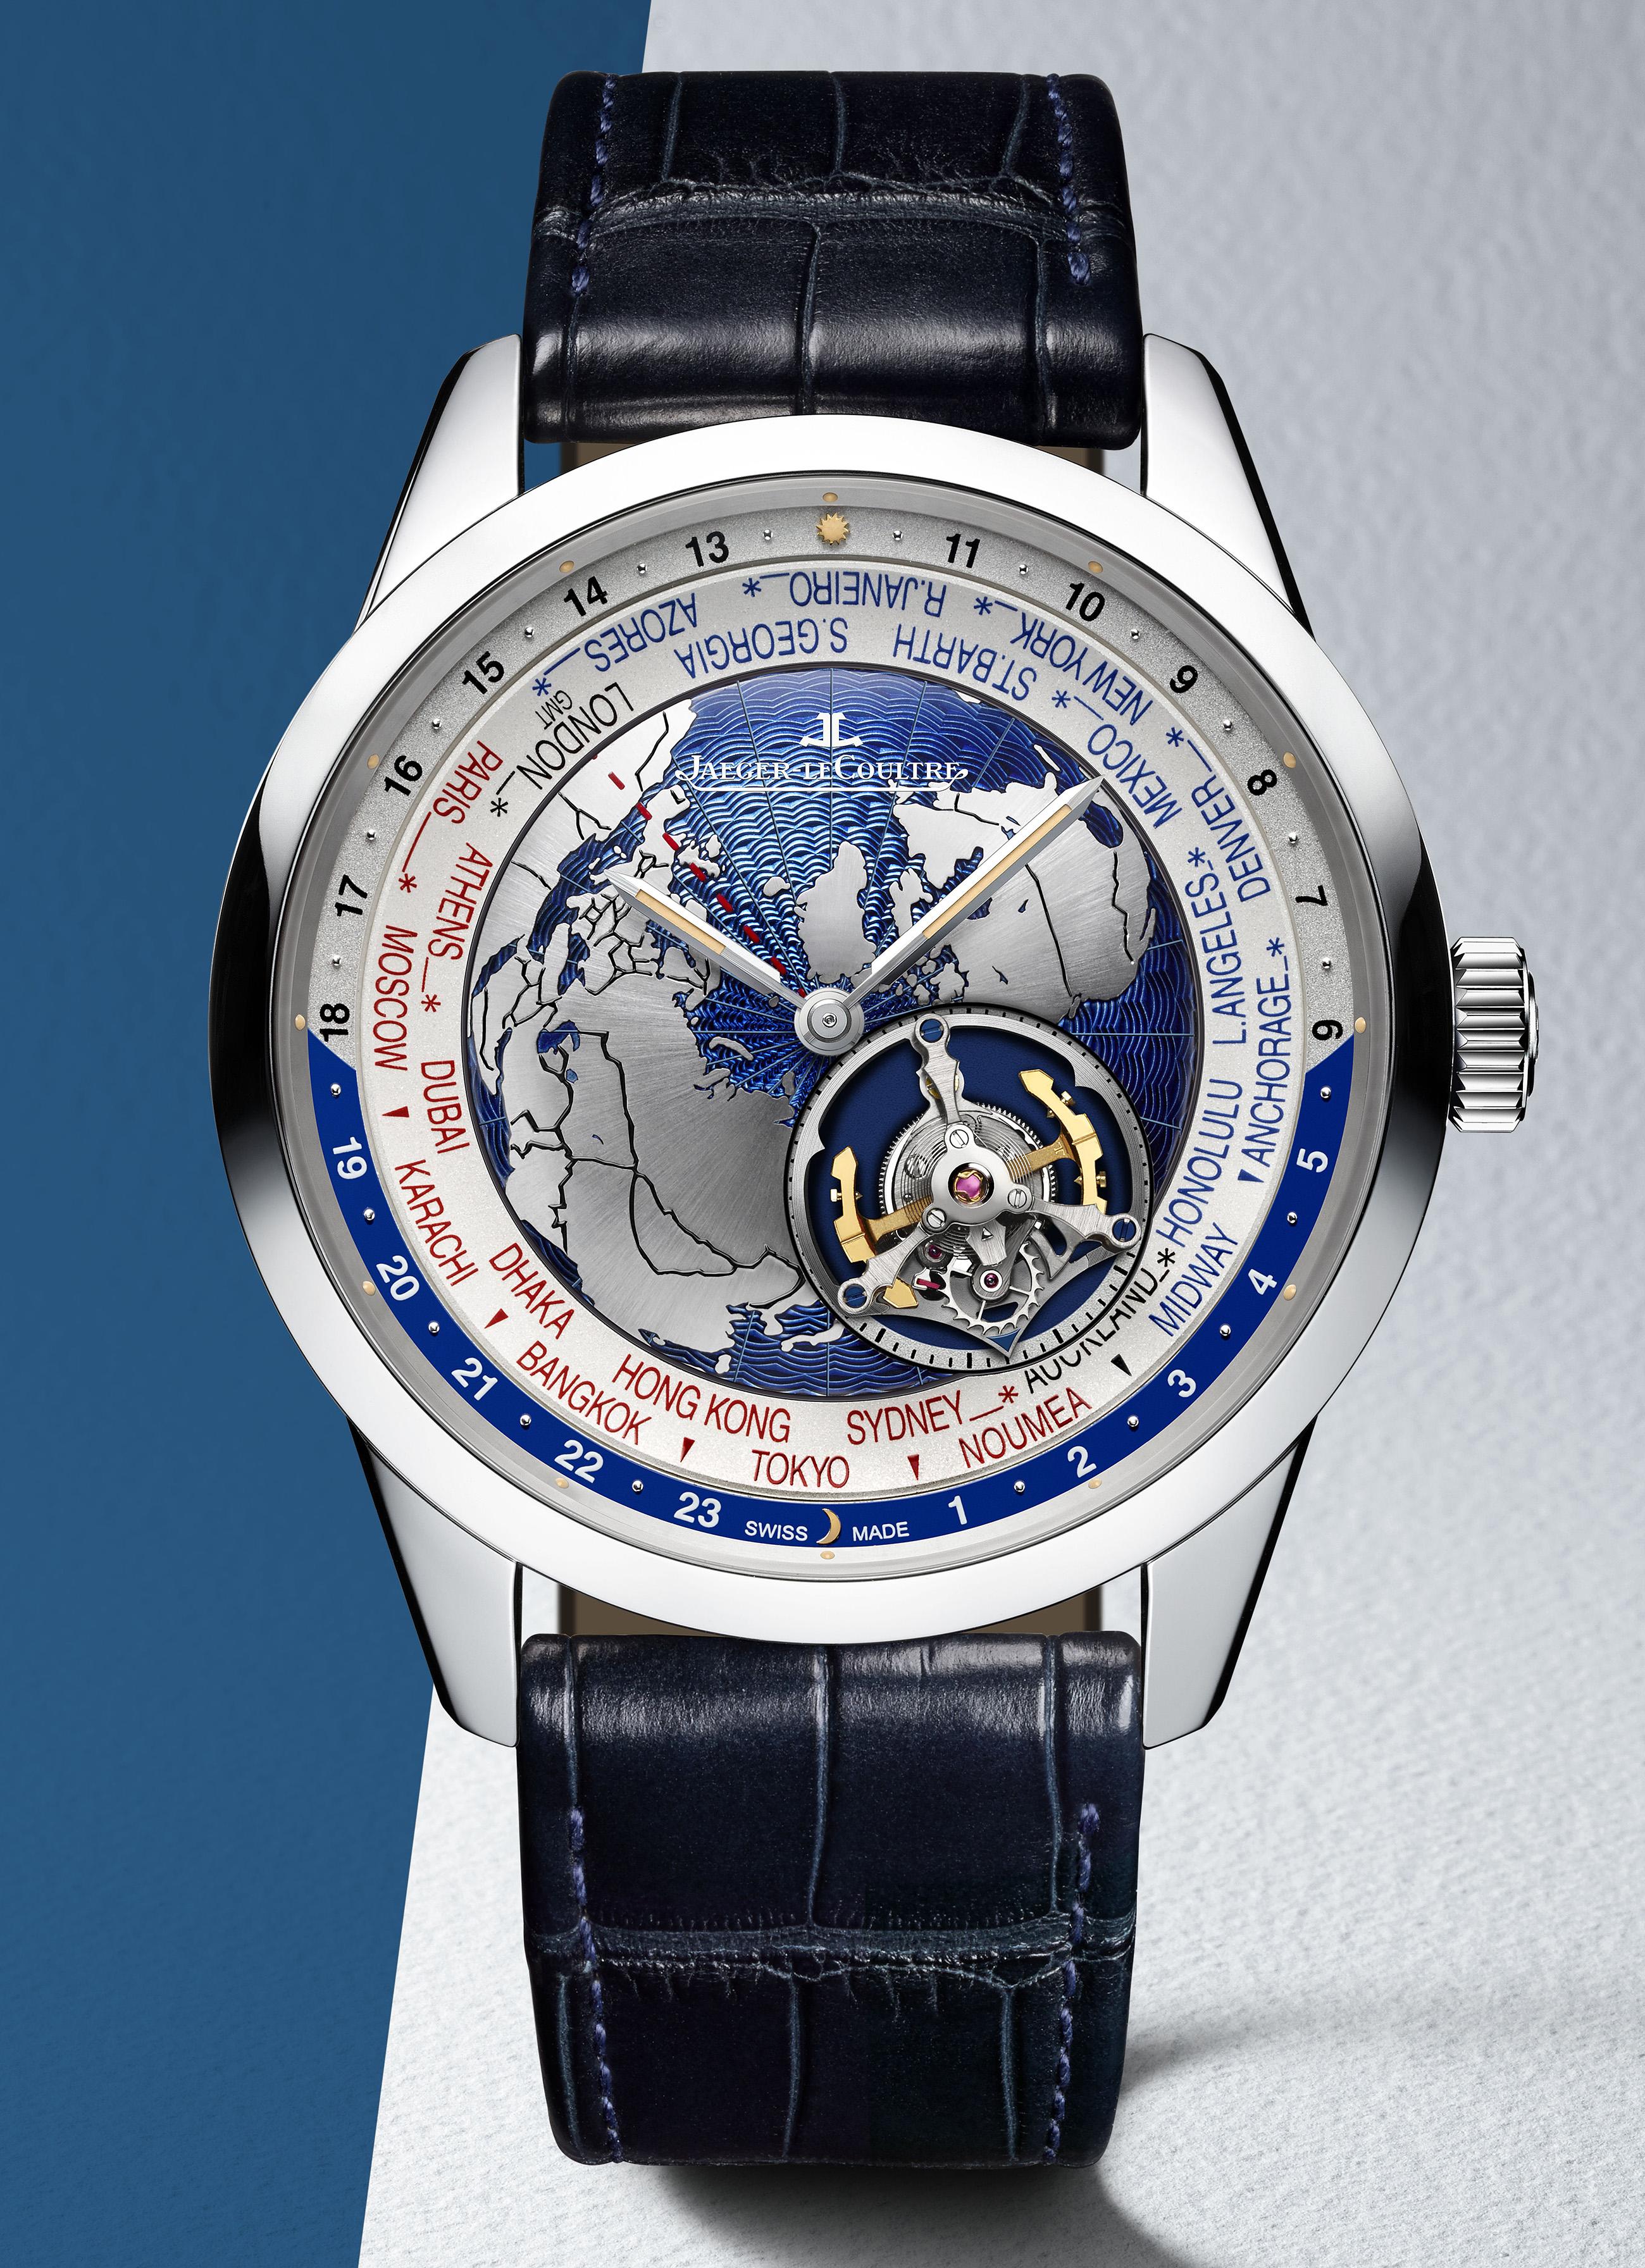 Jaeger-LeCoultre Geophysic Tourbillon Universal Time _BG copy